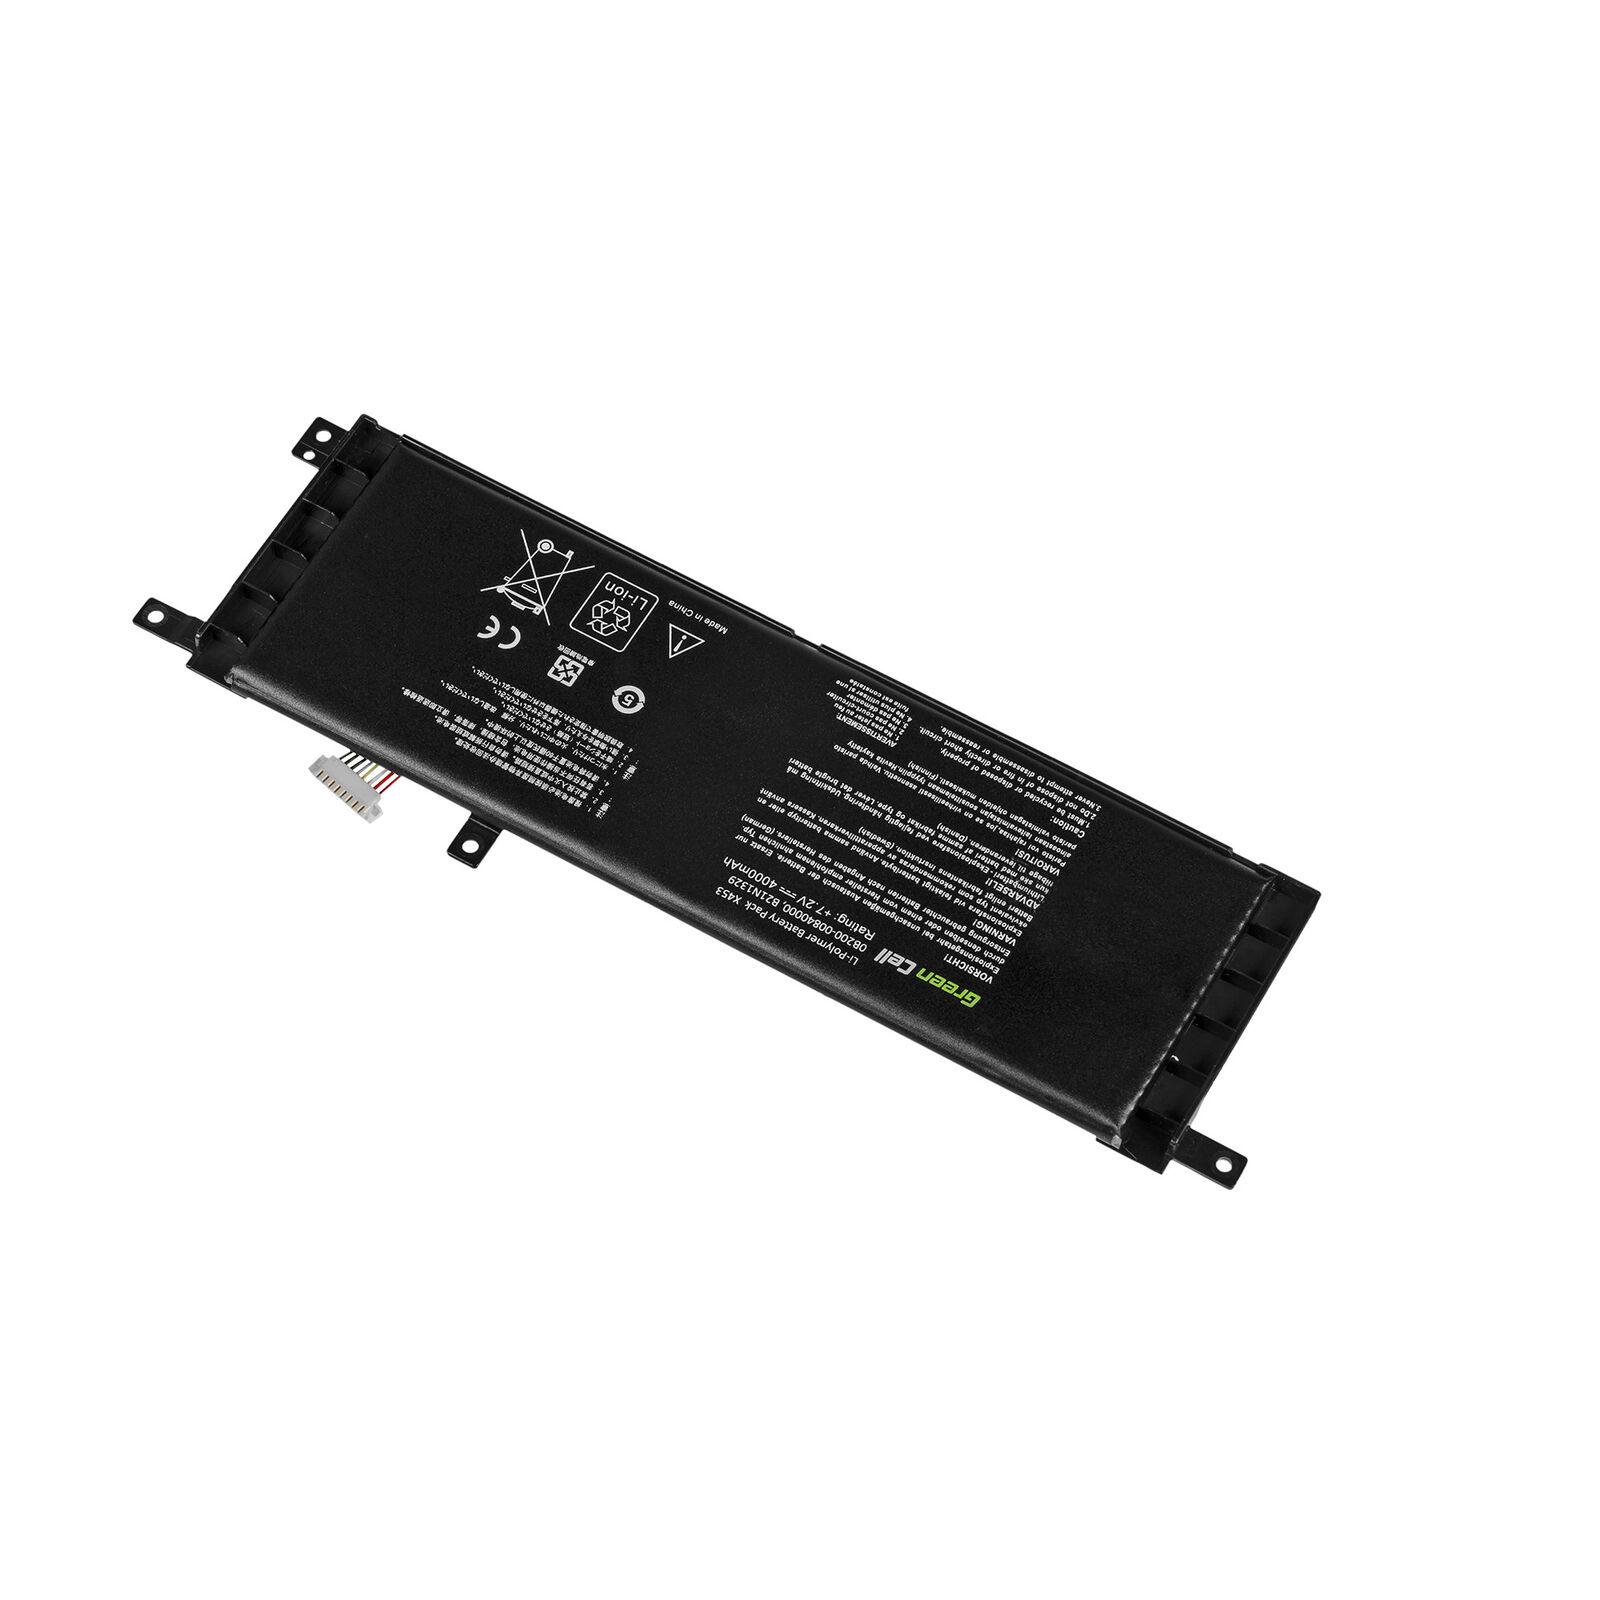 Batería para 0B200-00840000 B21N1329 B21NI329 B2IN1329 Asus Laptop 4000mAh(compatible)